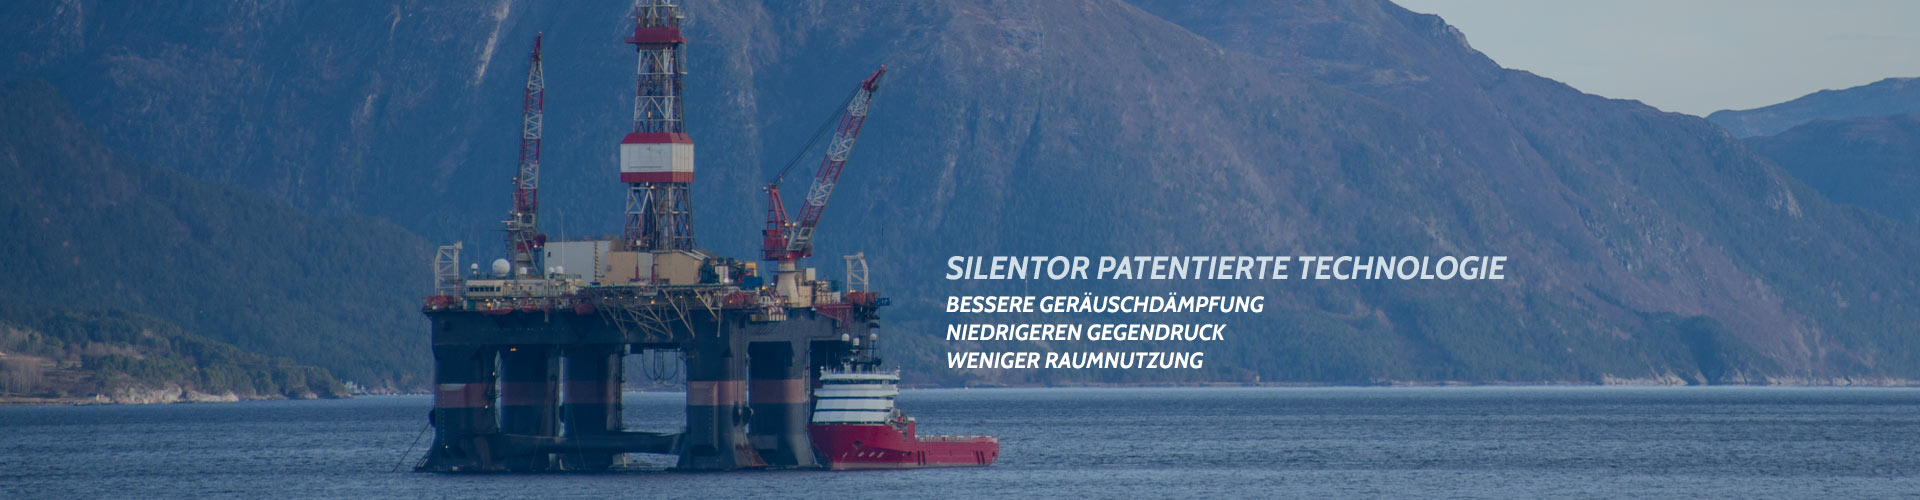 silentor-banner-offshore-de